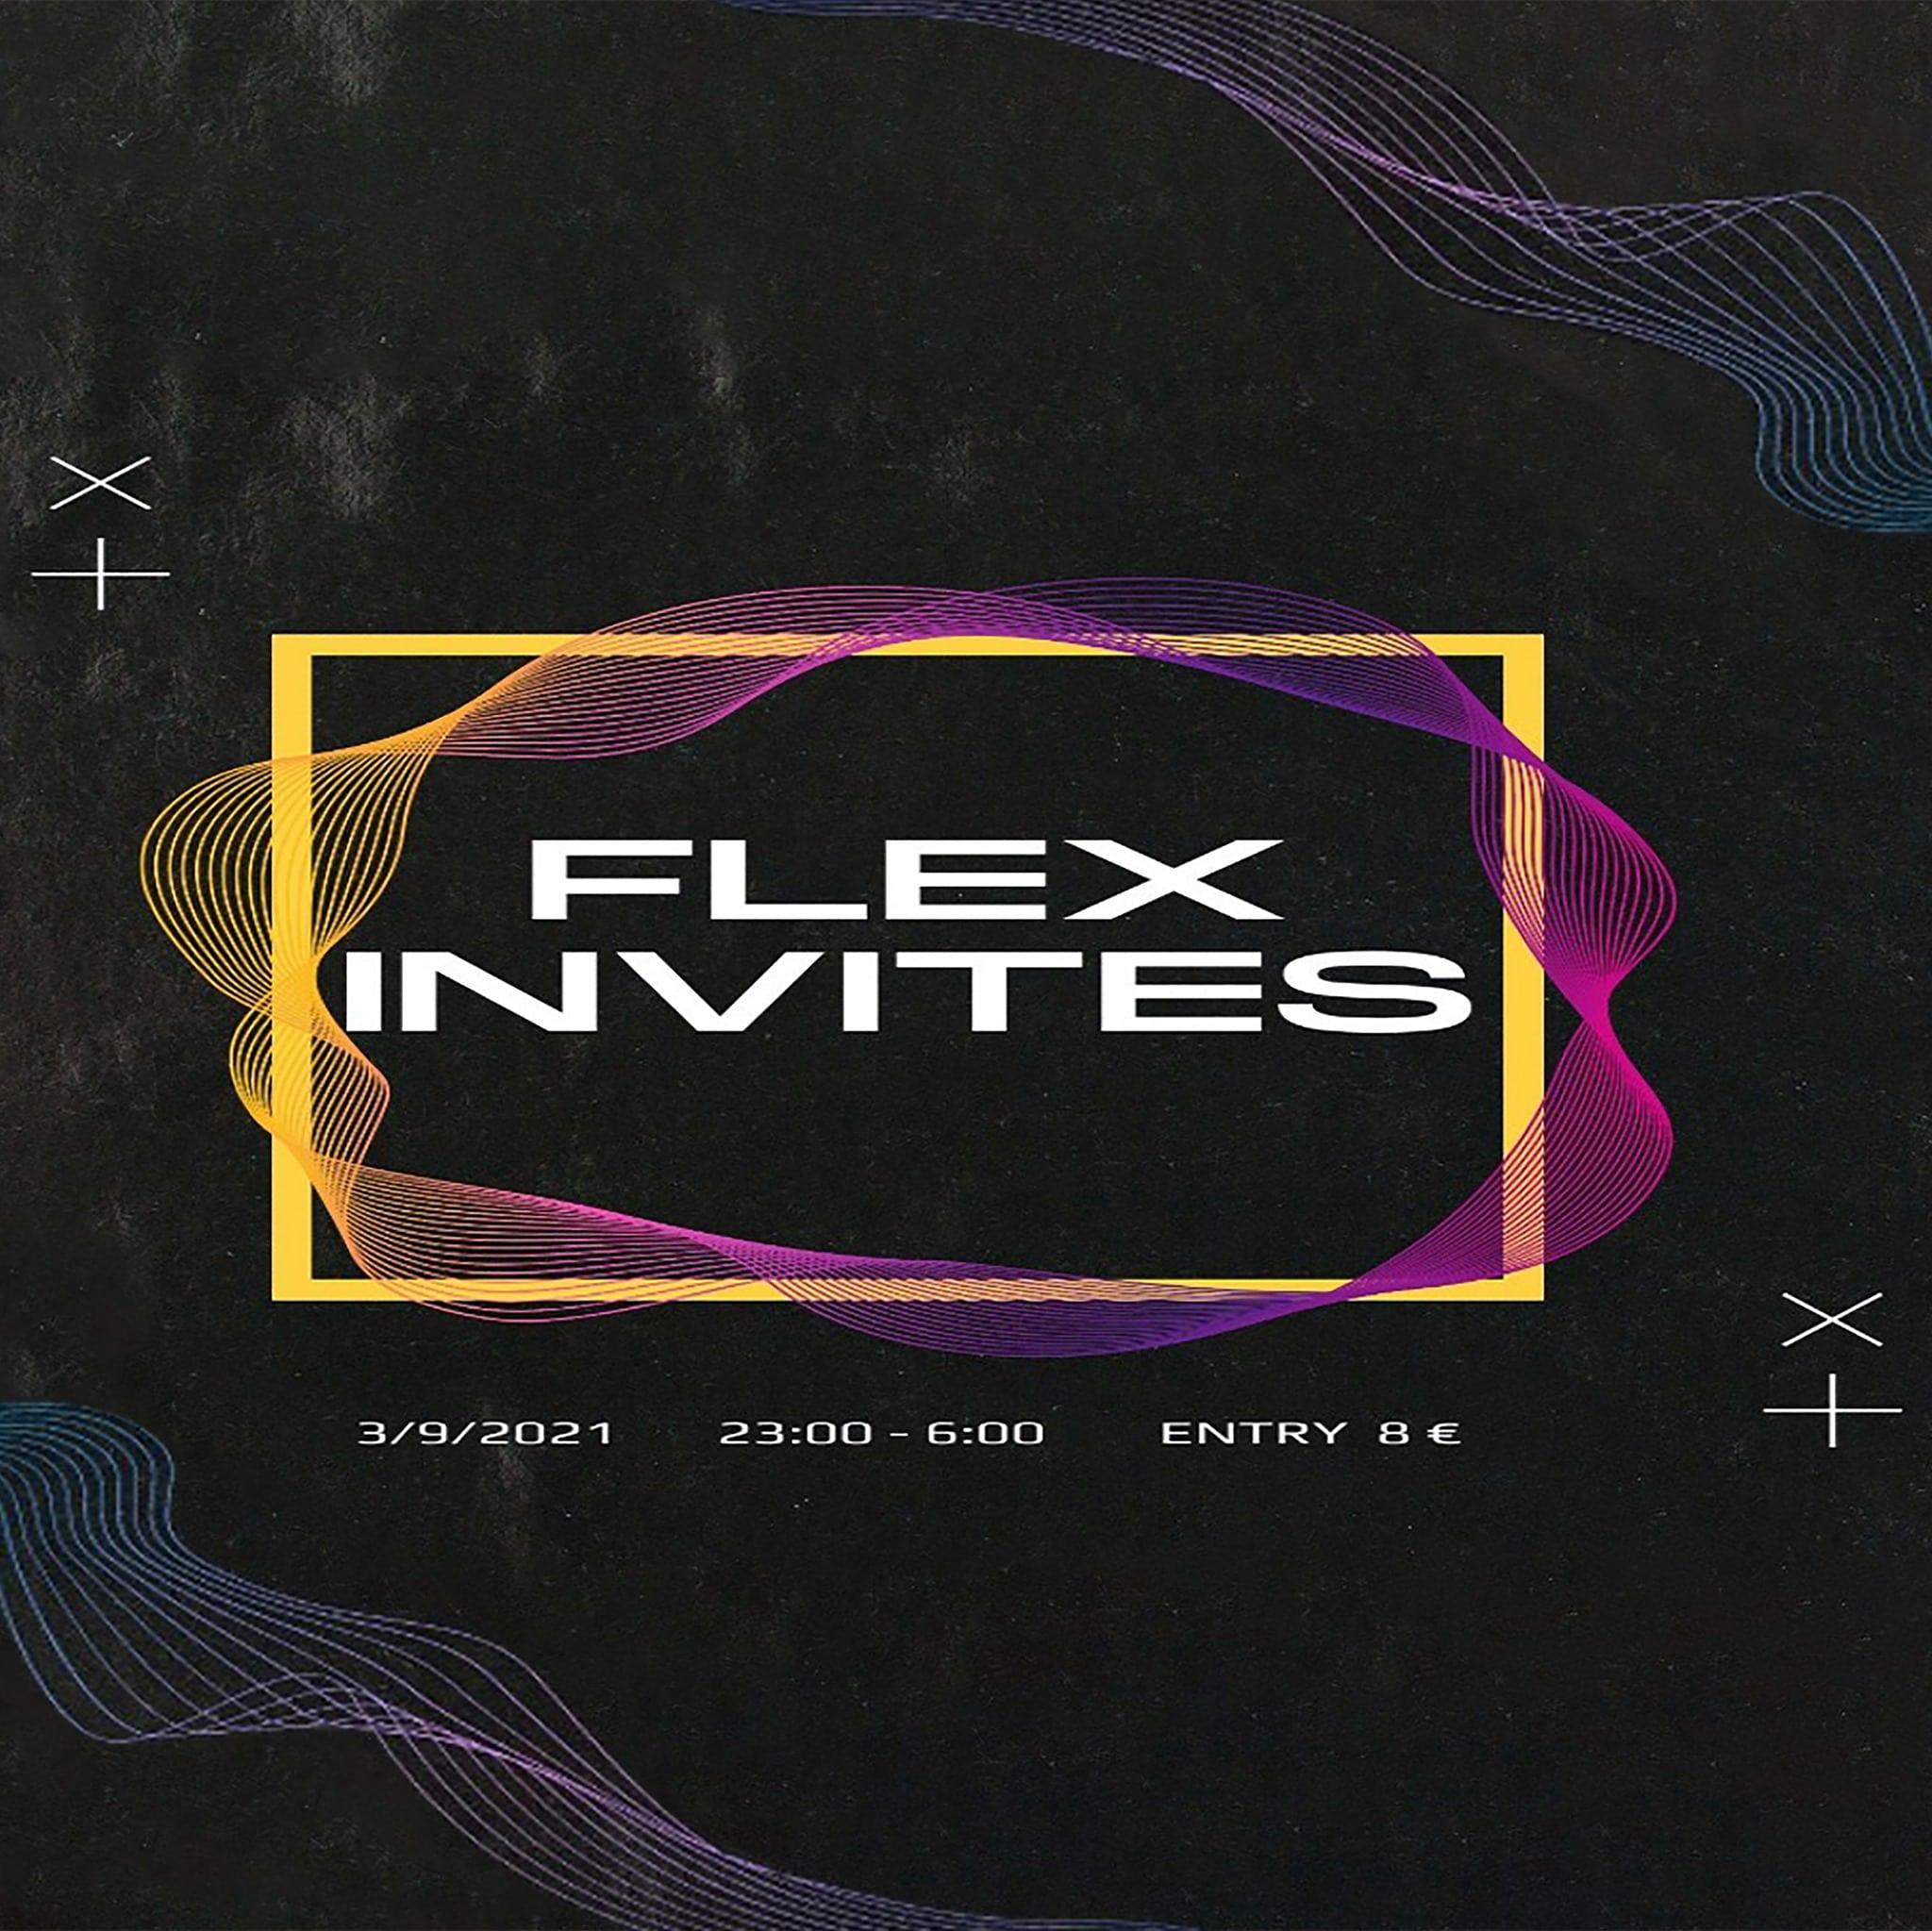 Events Wien: FLEX Invites top selected DJs